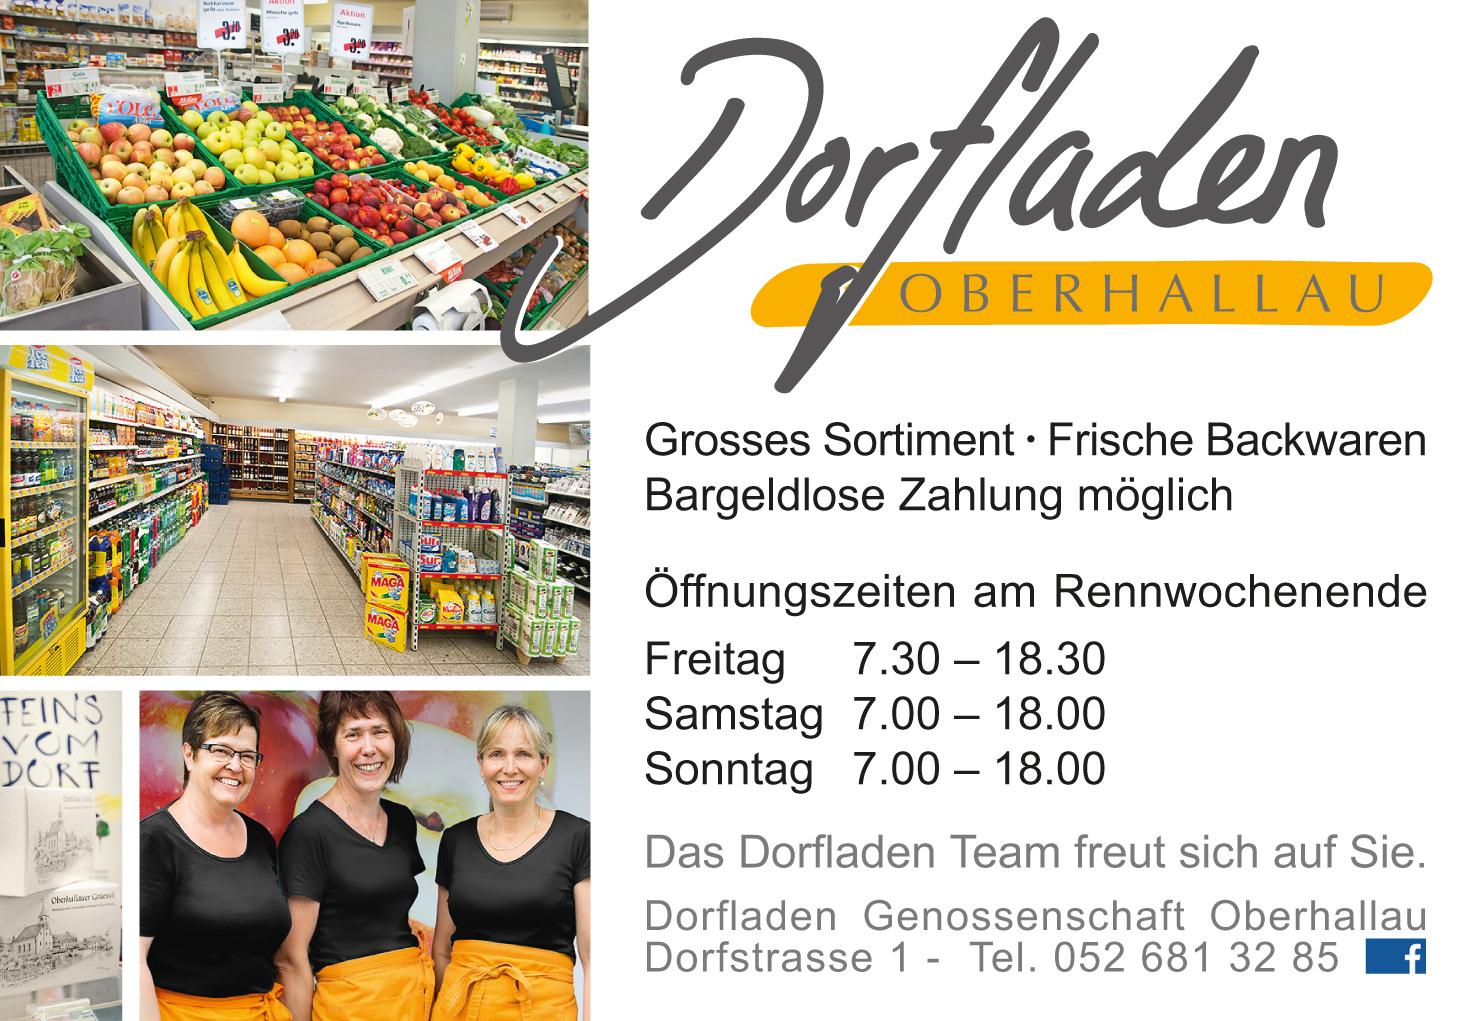 Dorfladen Oberhallau